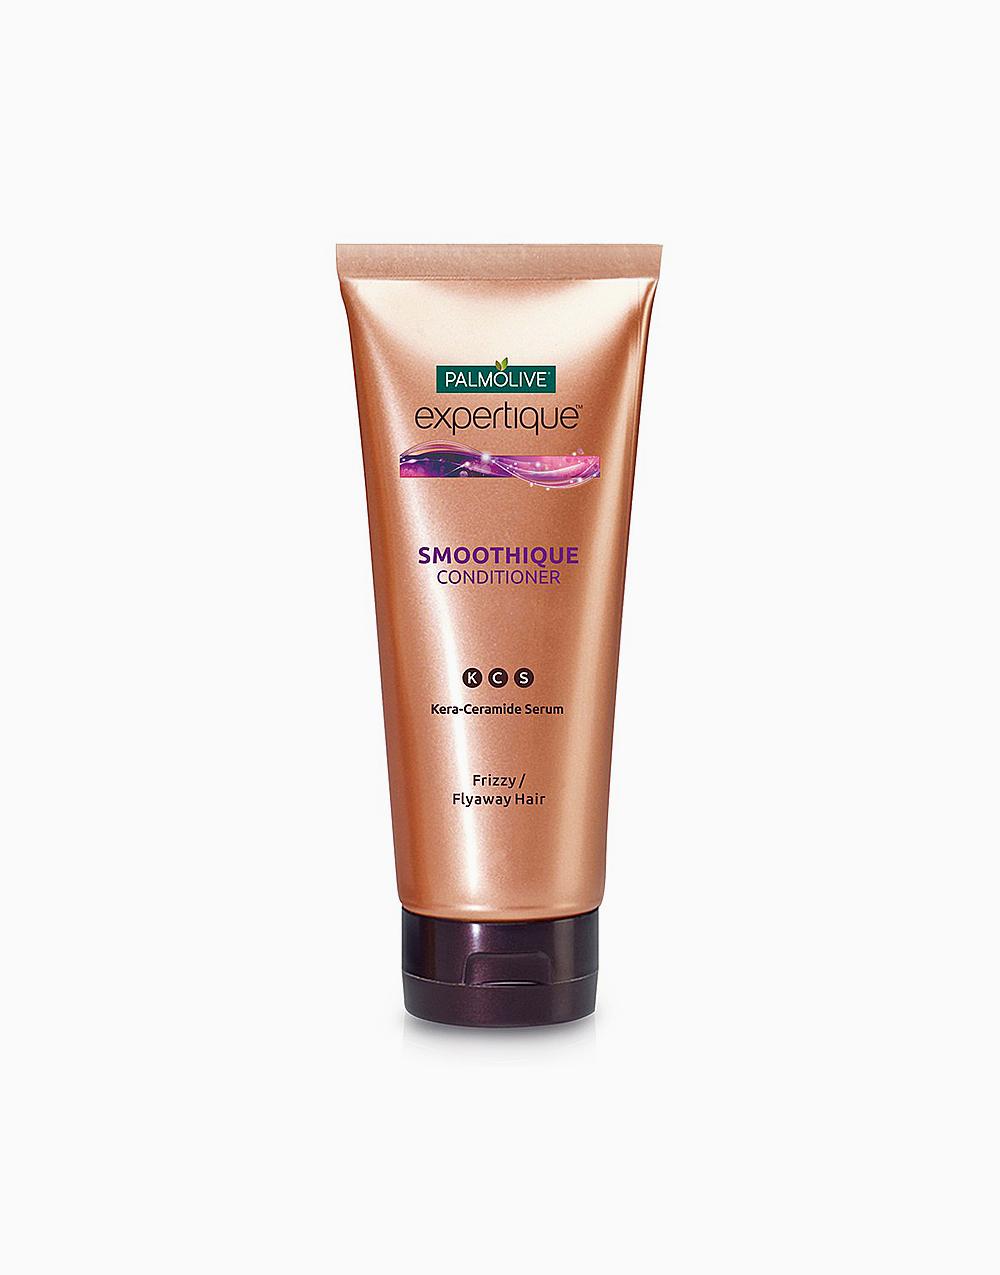 Palmolive Expertique Keratin + Ceramide Conditioner Smoothique (340ml) by Palmolive